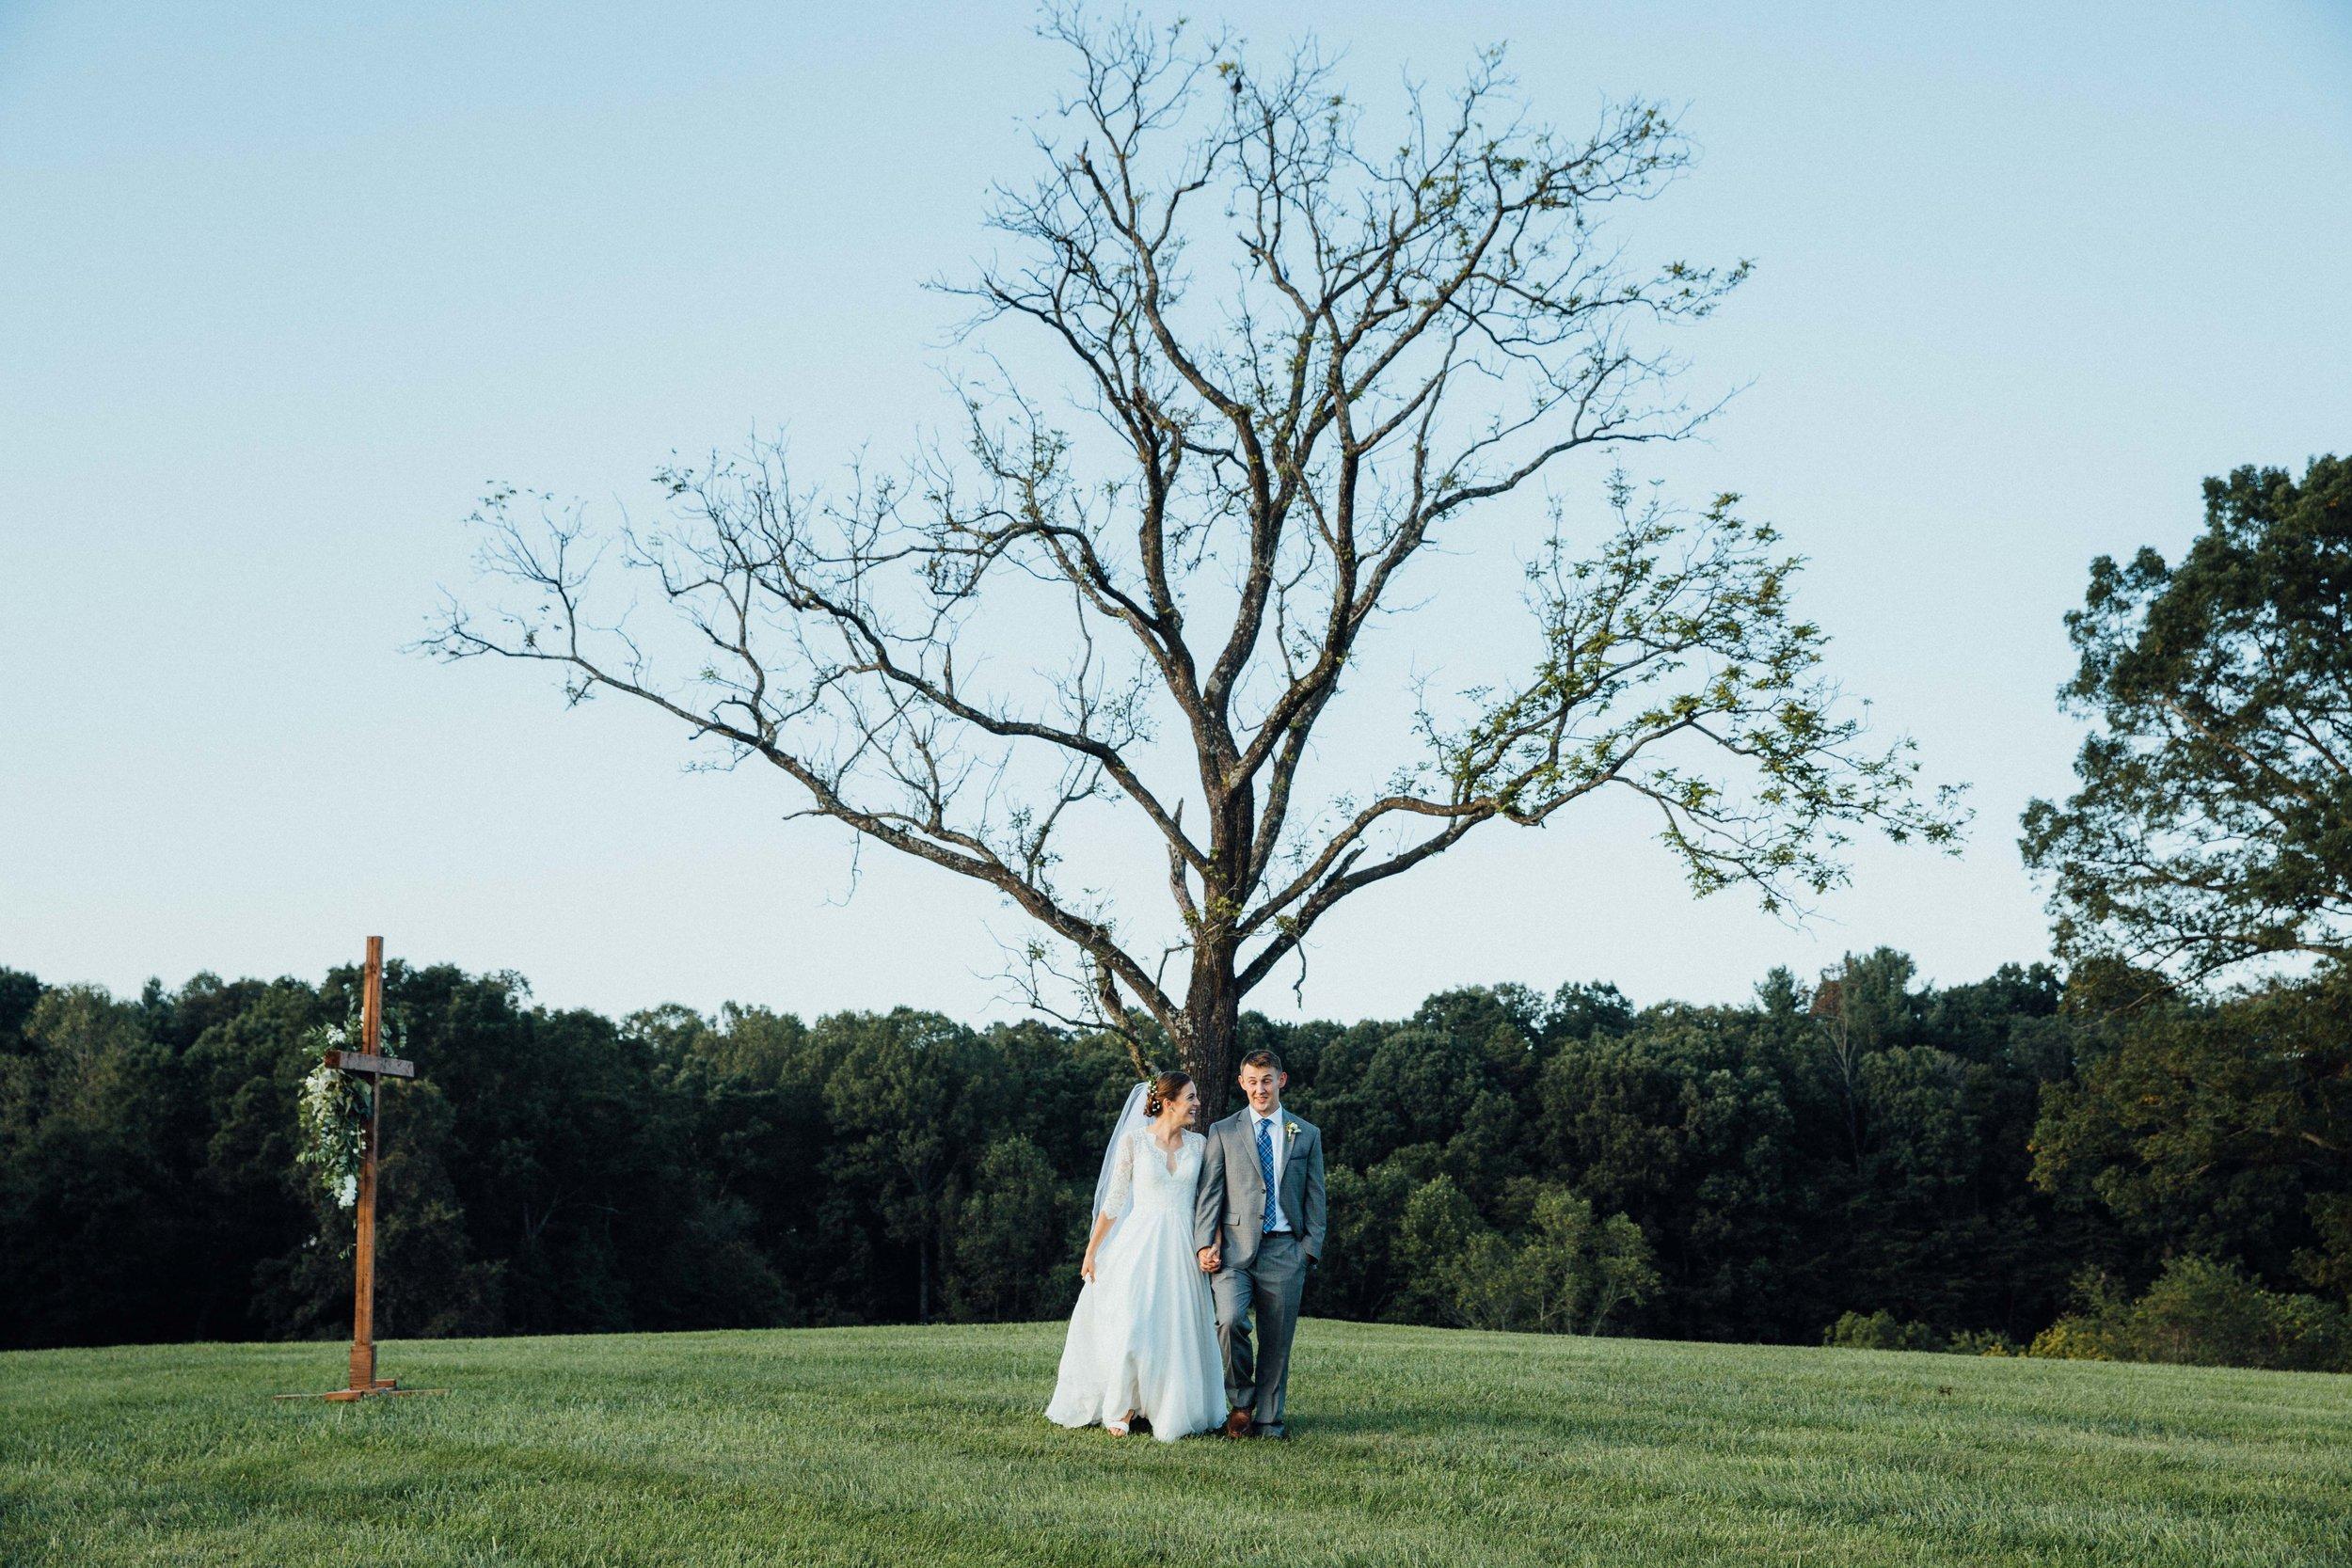 Earley_Wedding_WEB-32.jpg